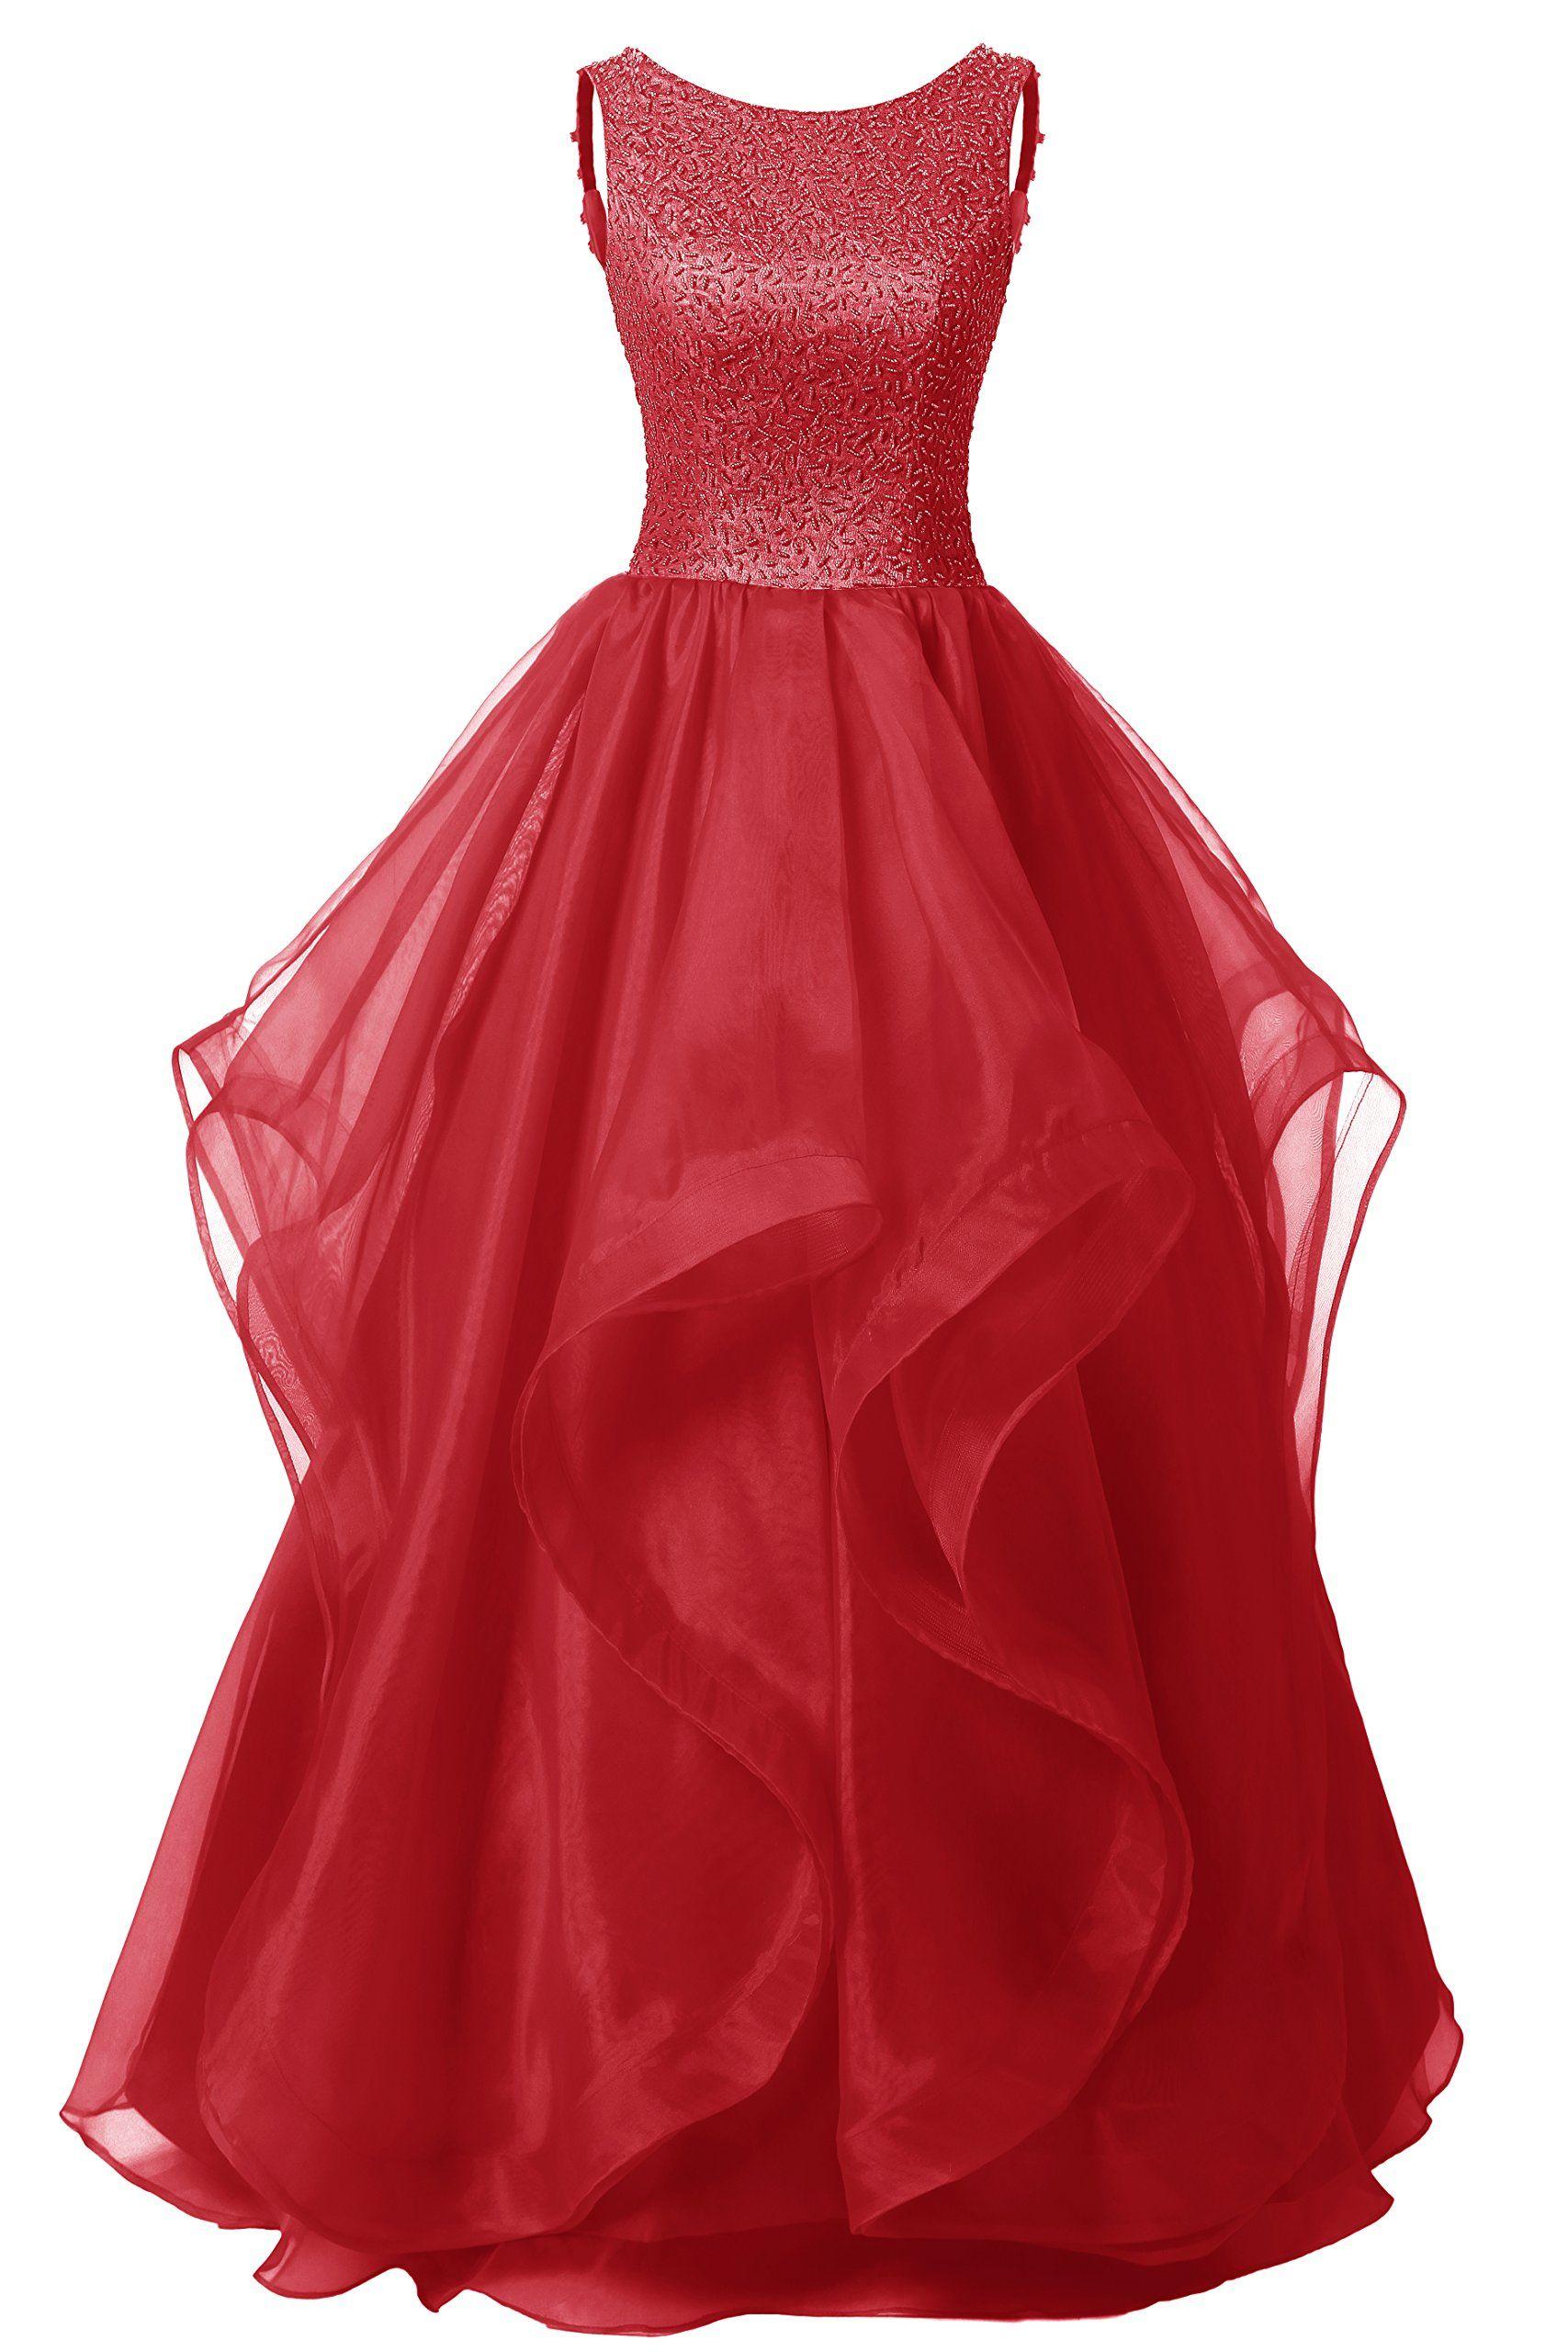 Dresstells long prom dress asymmetric bridesmaid dress beaded